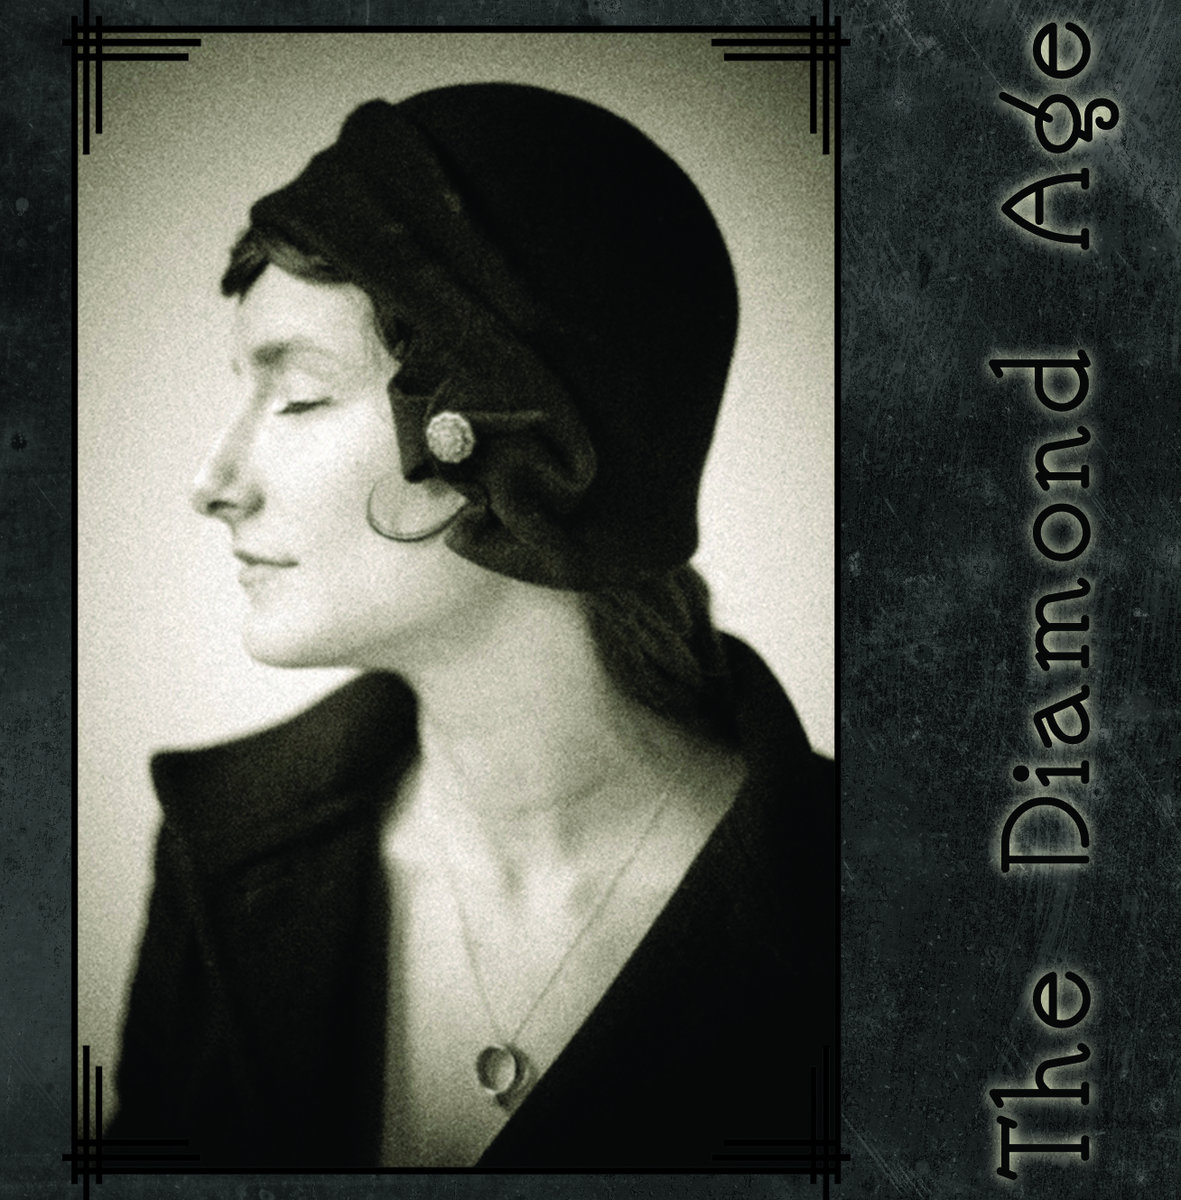 Pamela Samuelson : The Diamond Age (2012)